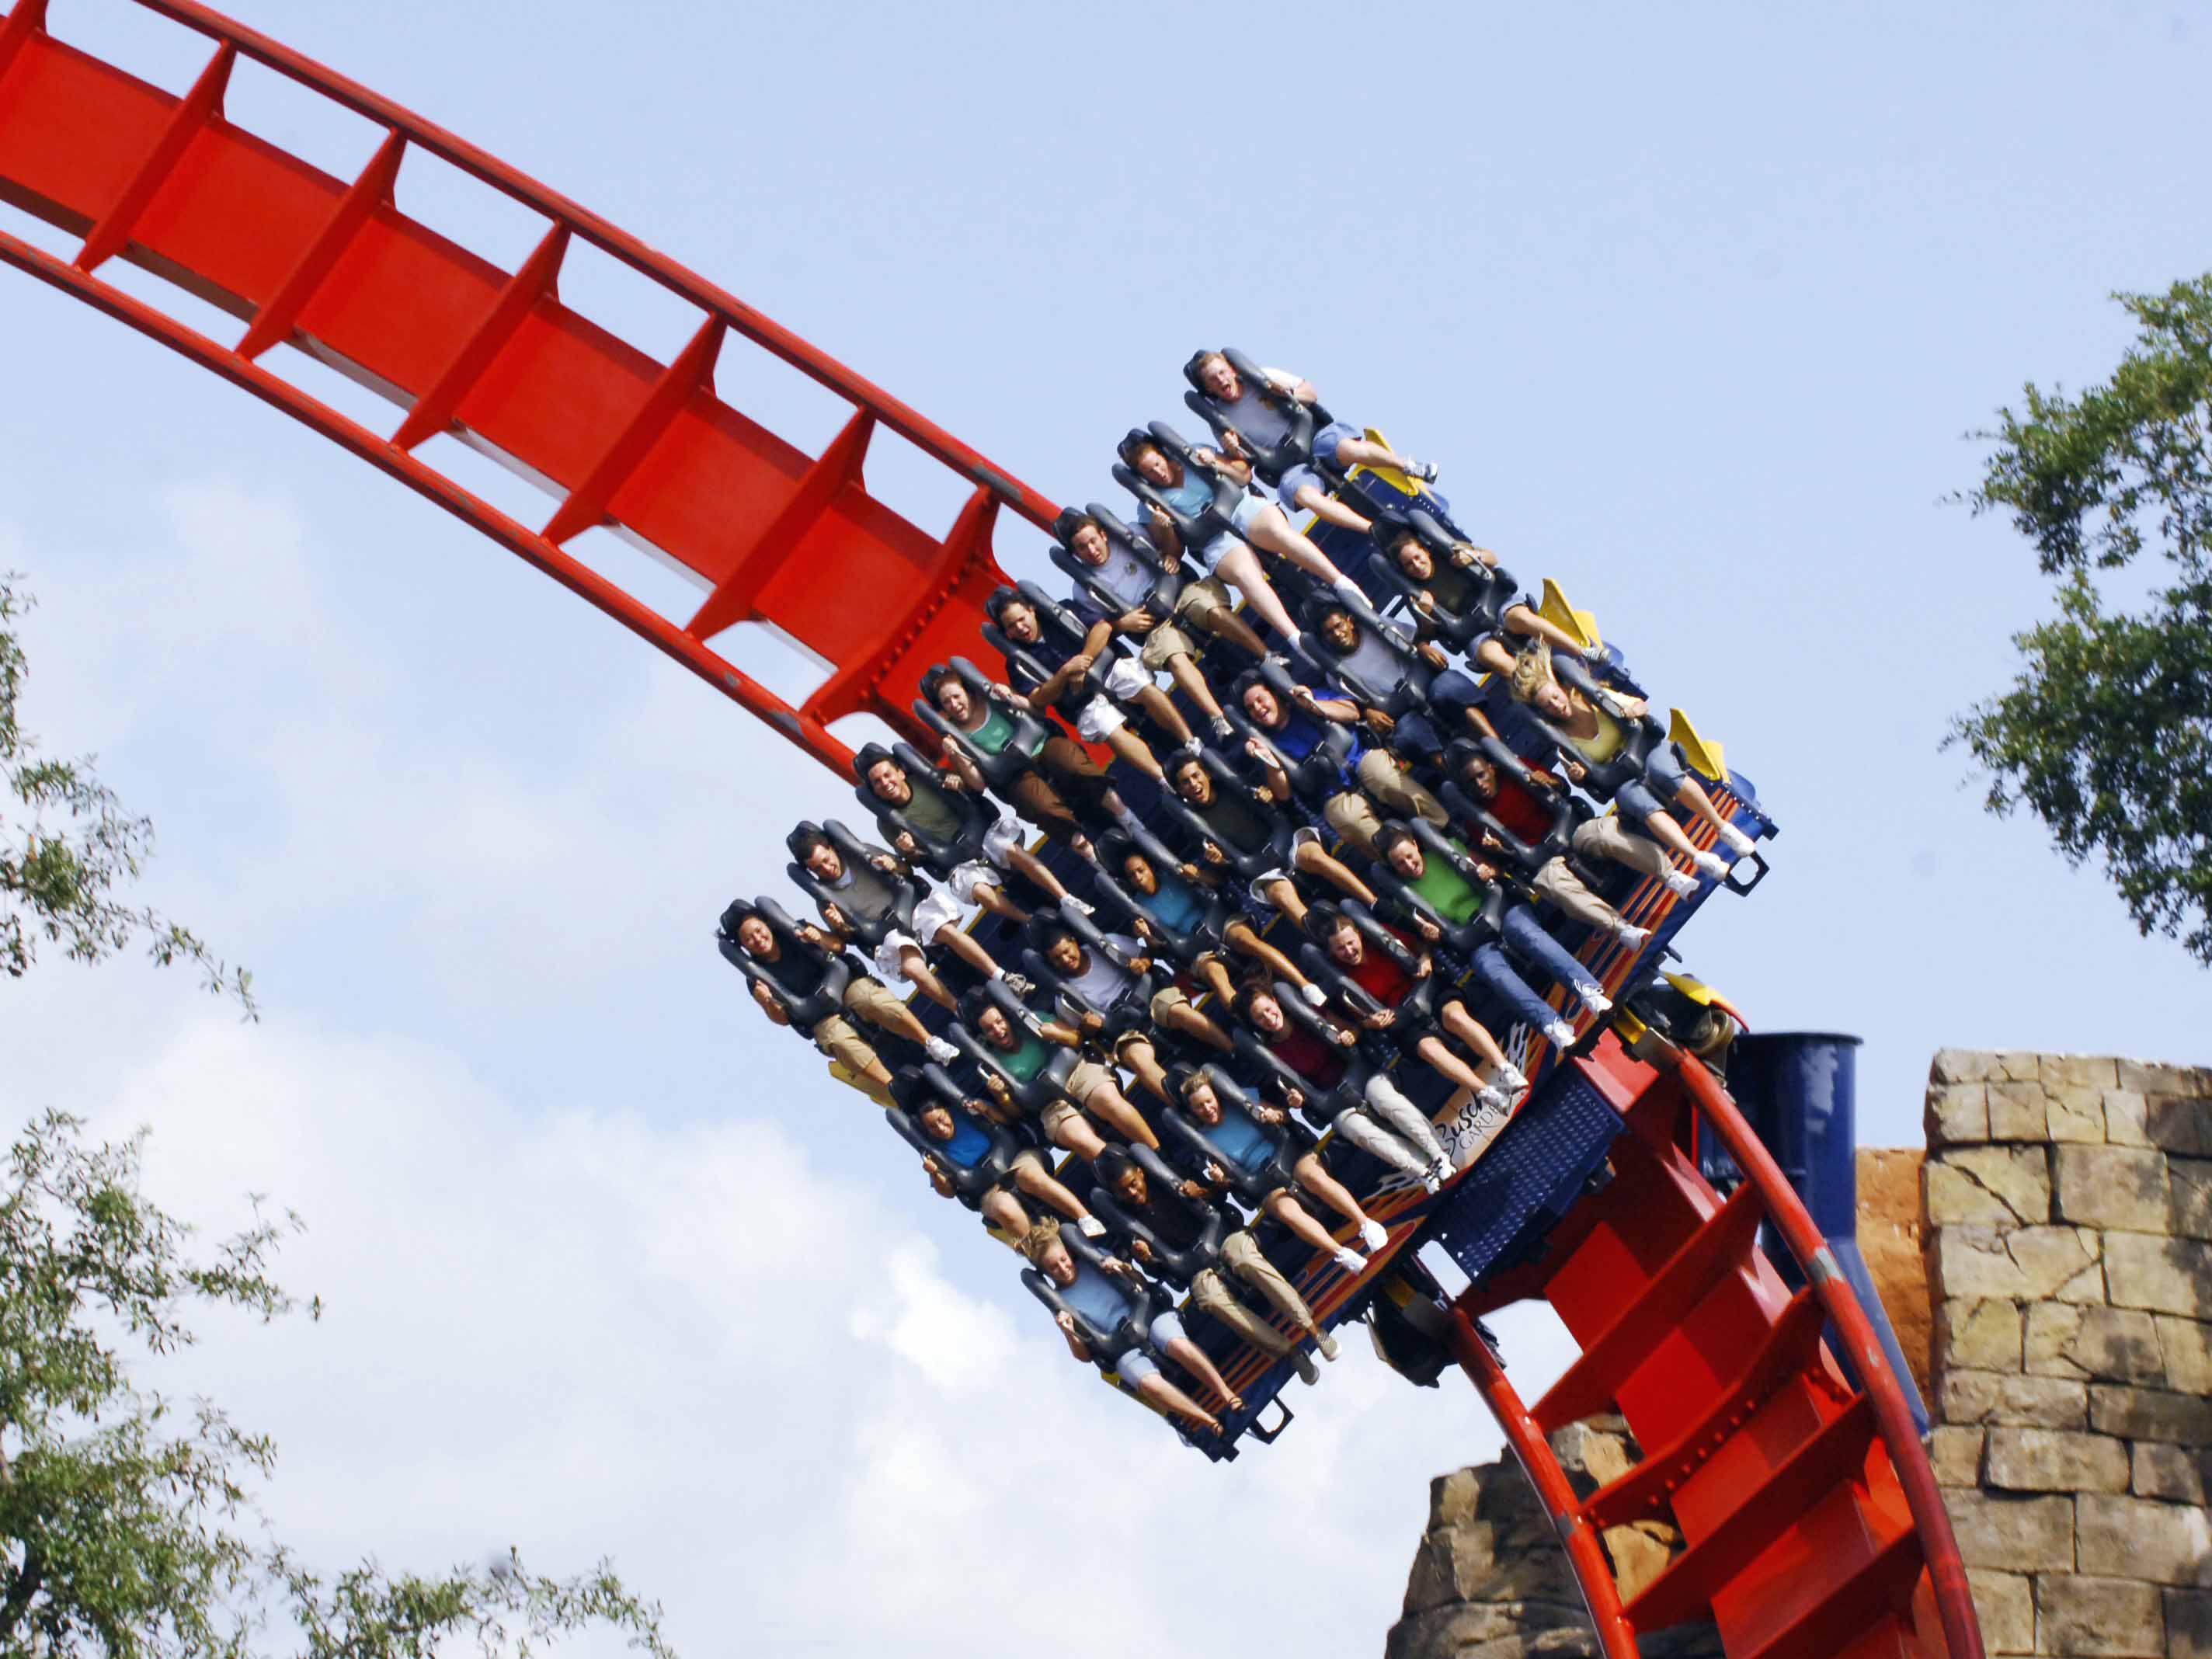 2 Park Seaworld And Busch Gardens